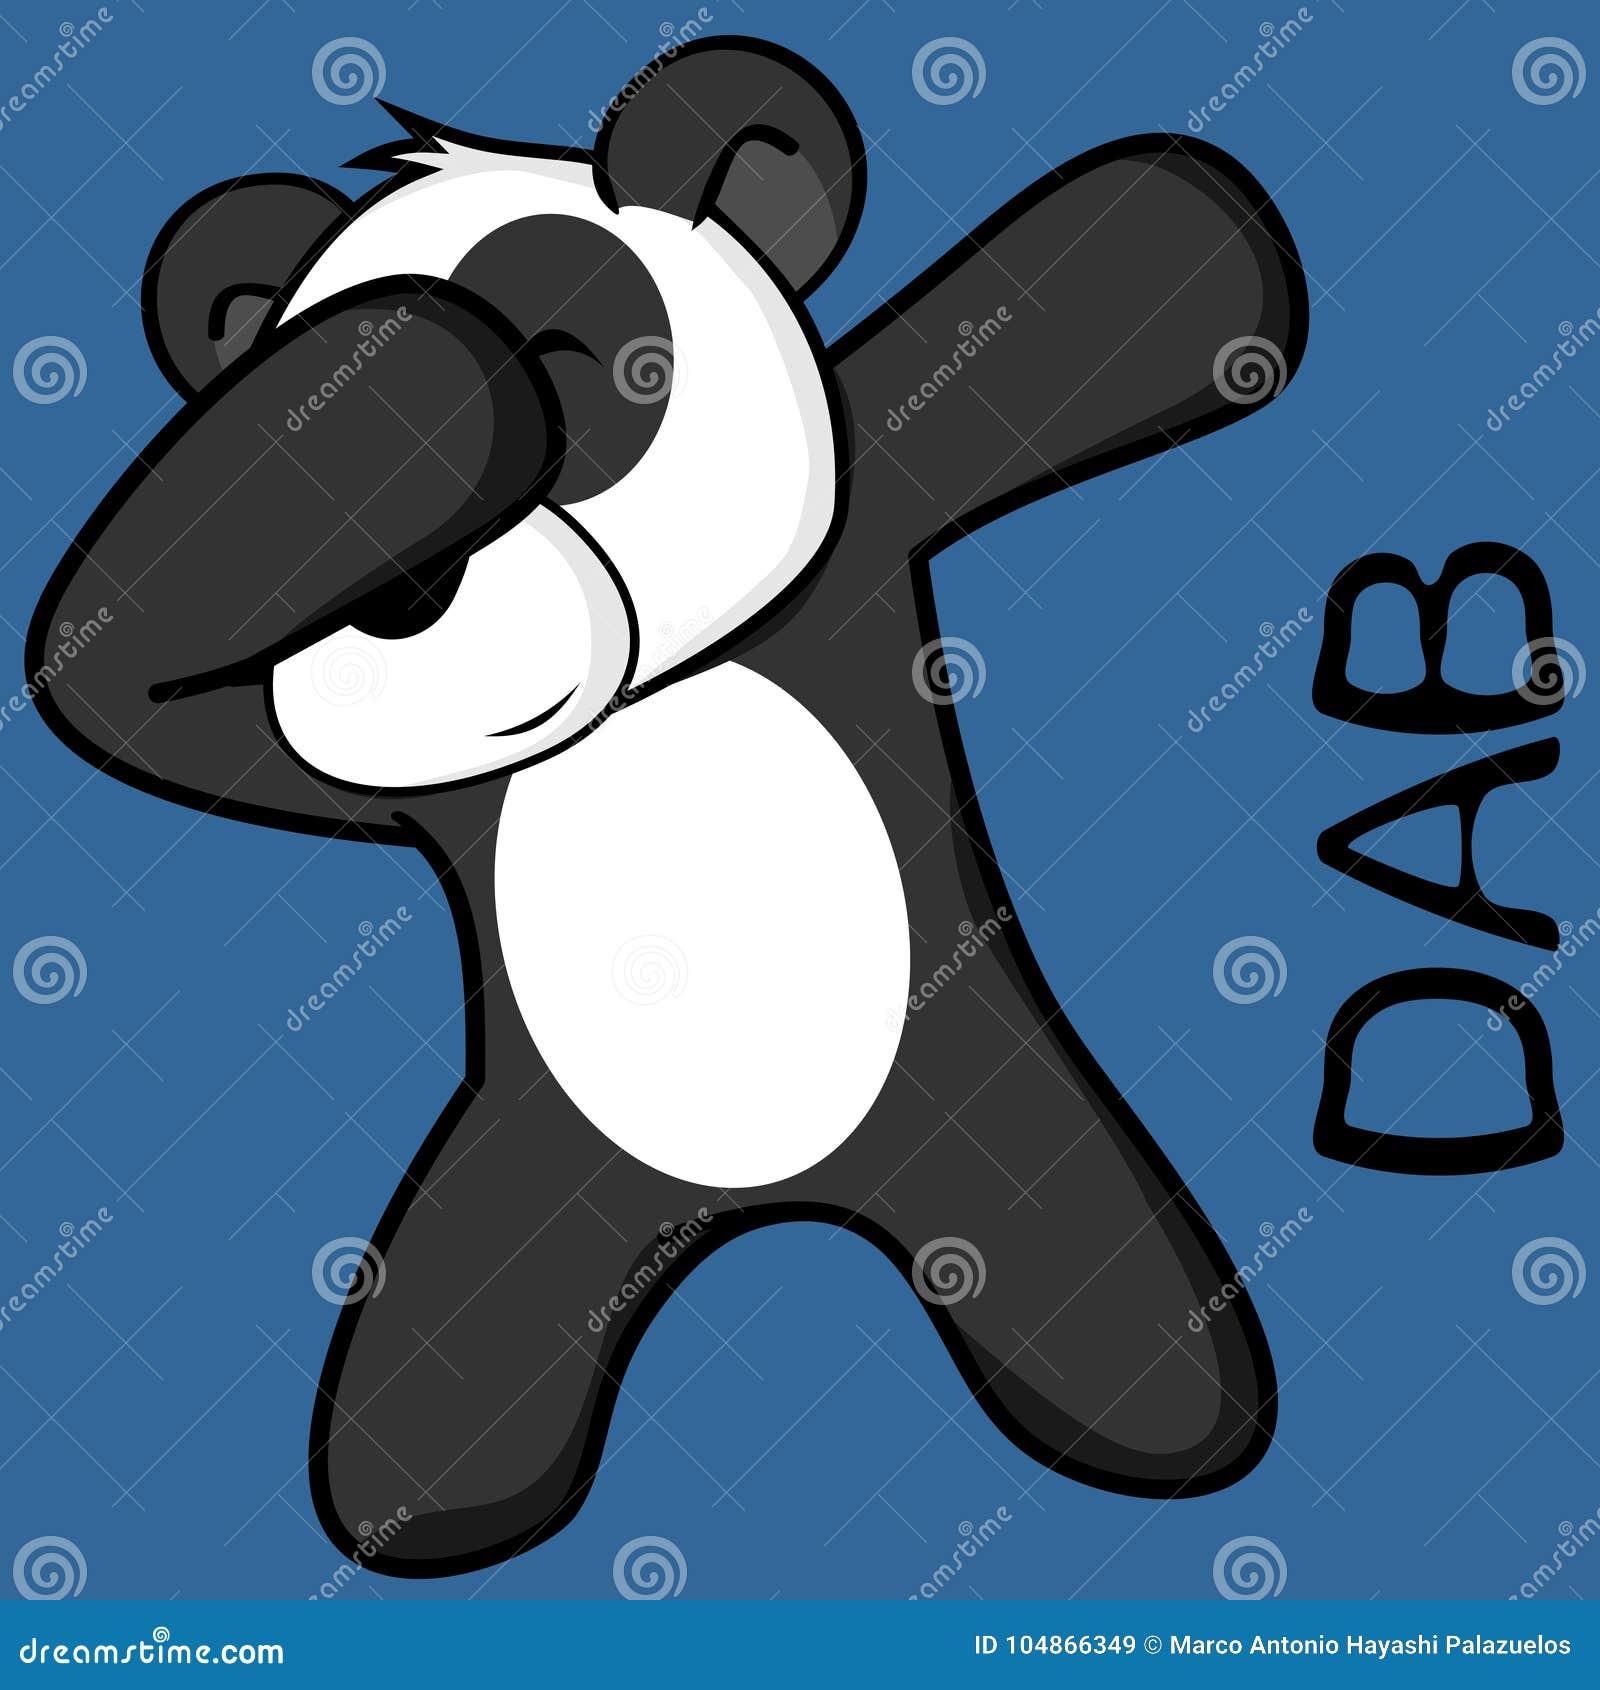 Dab dabbing pose panda bear kid cartoon